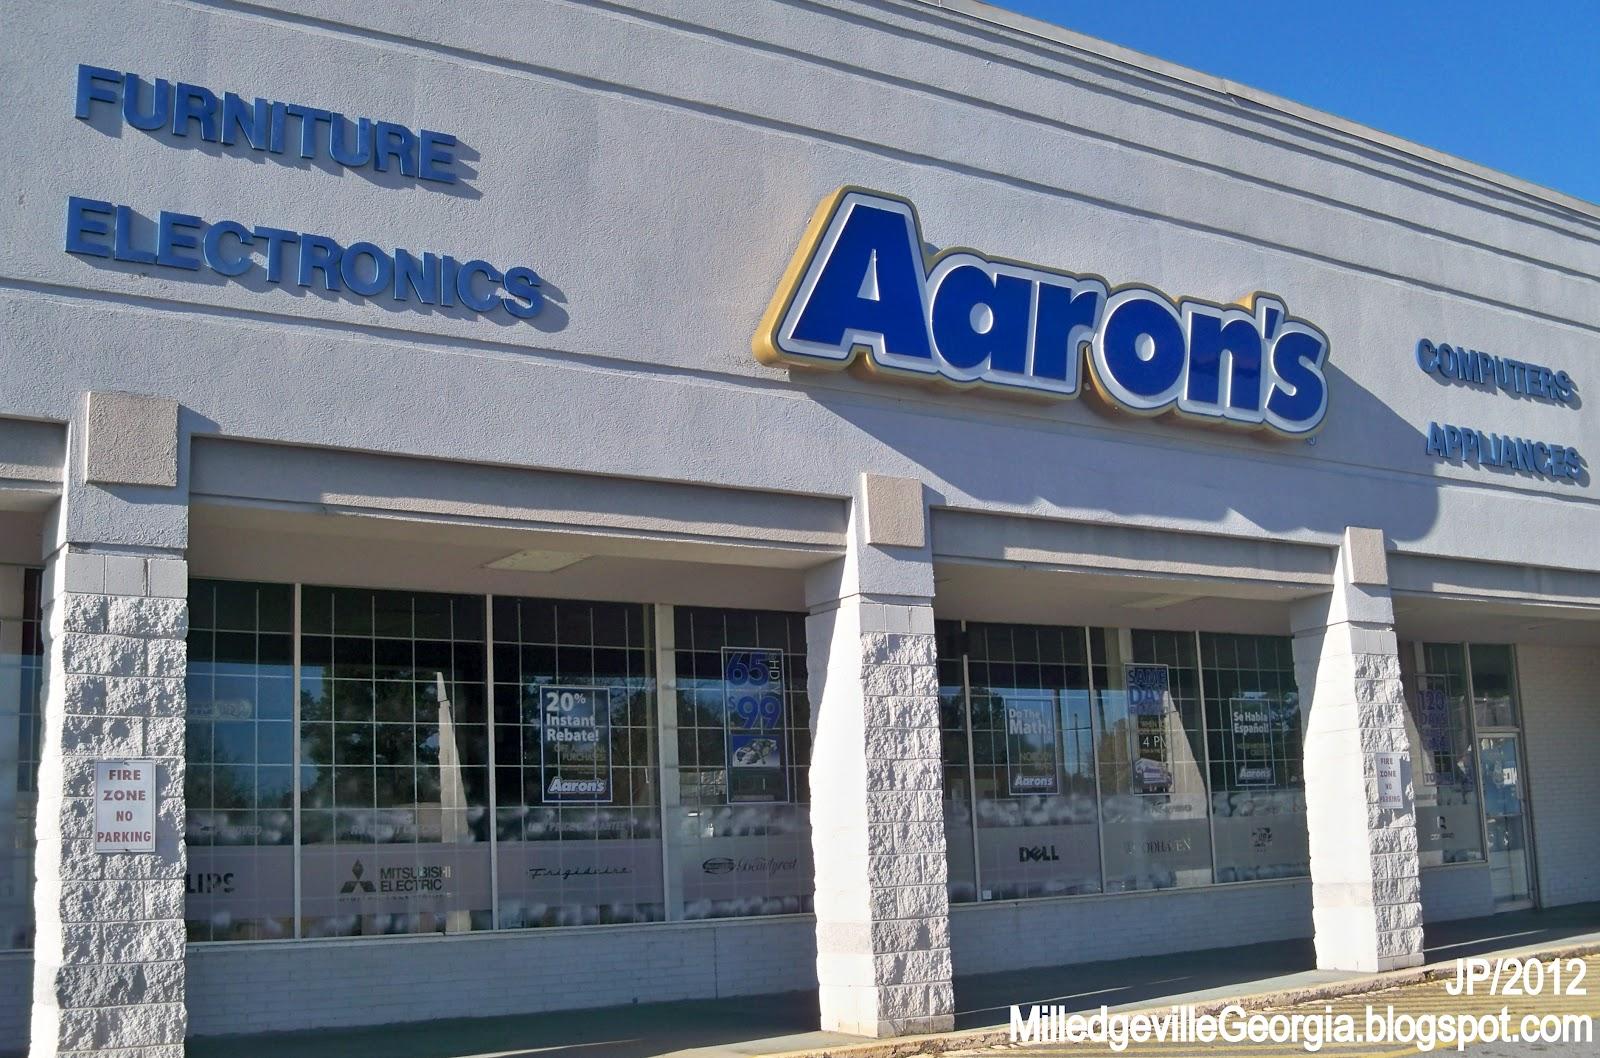 AARONu0027S MILLEDGEVILLE GEORGIA N. Columbia St., Aaronu0027s Furniture  Electronics Appliance Store Baldwin County Milledgeville GA.